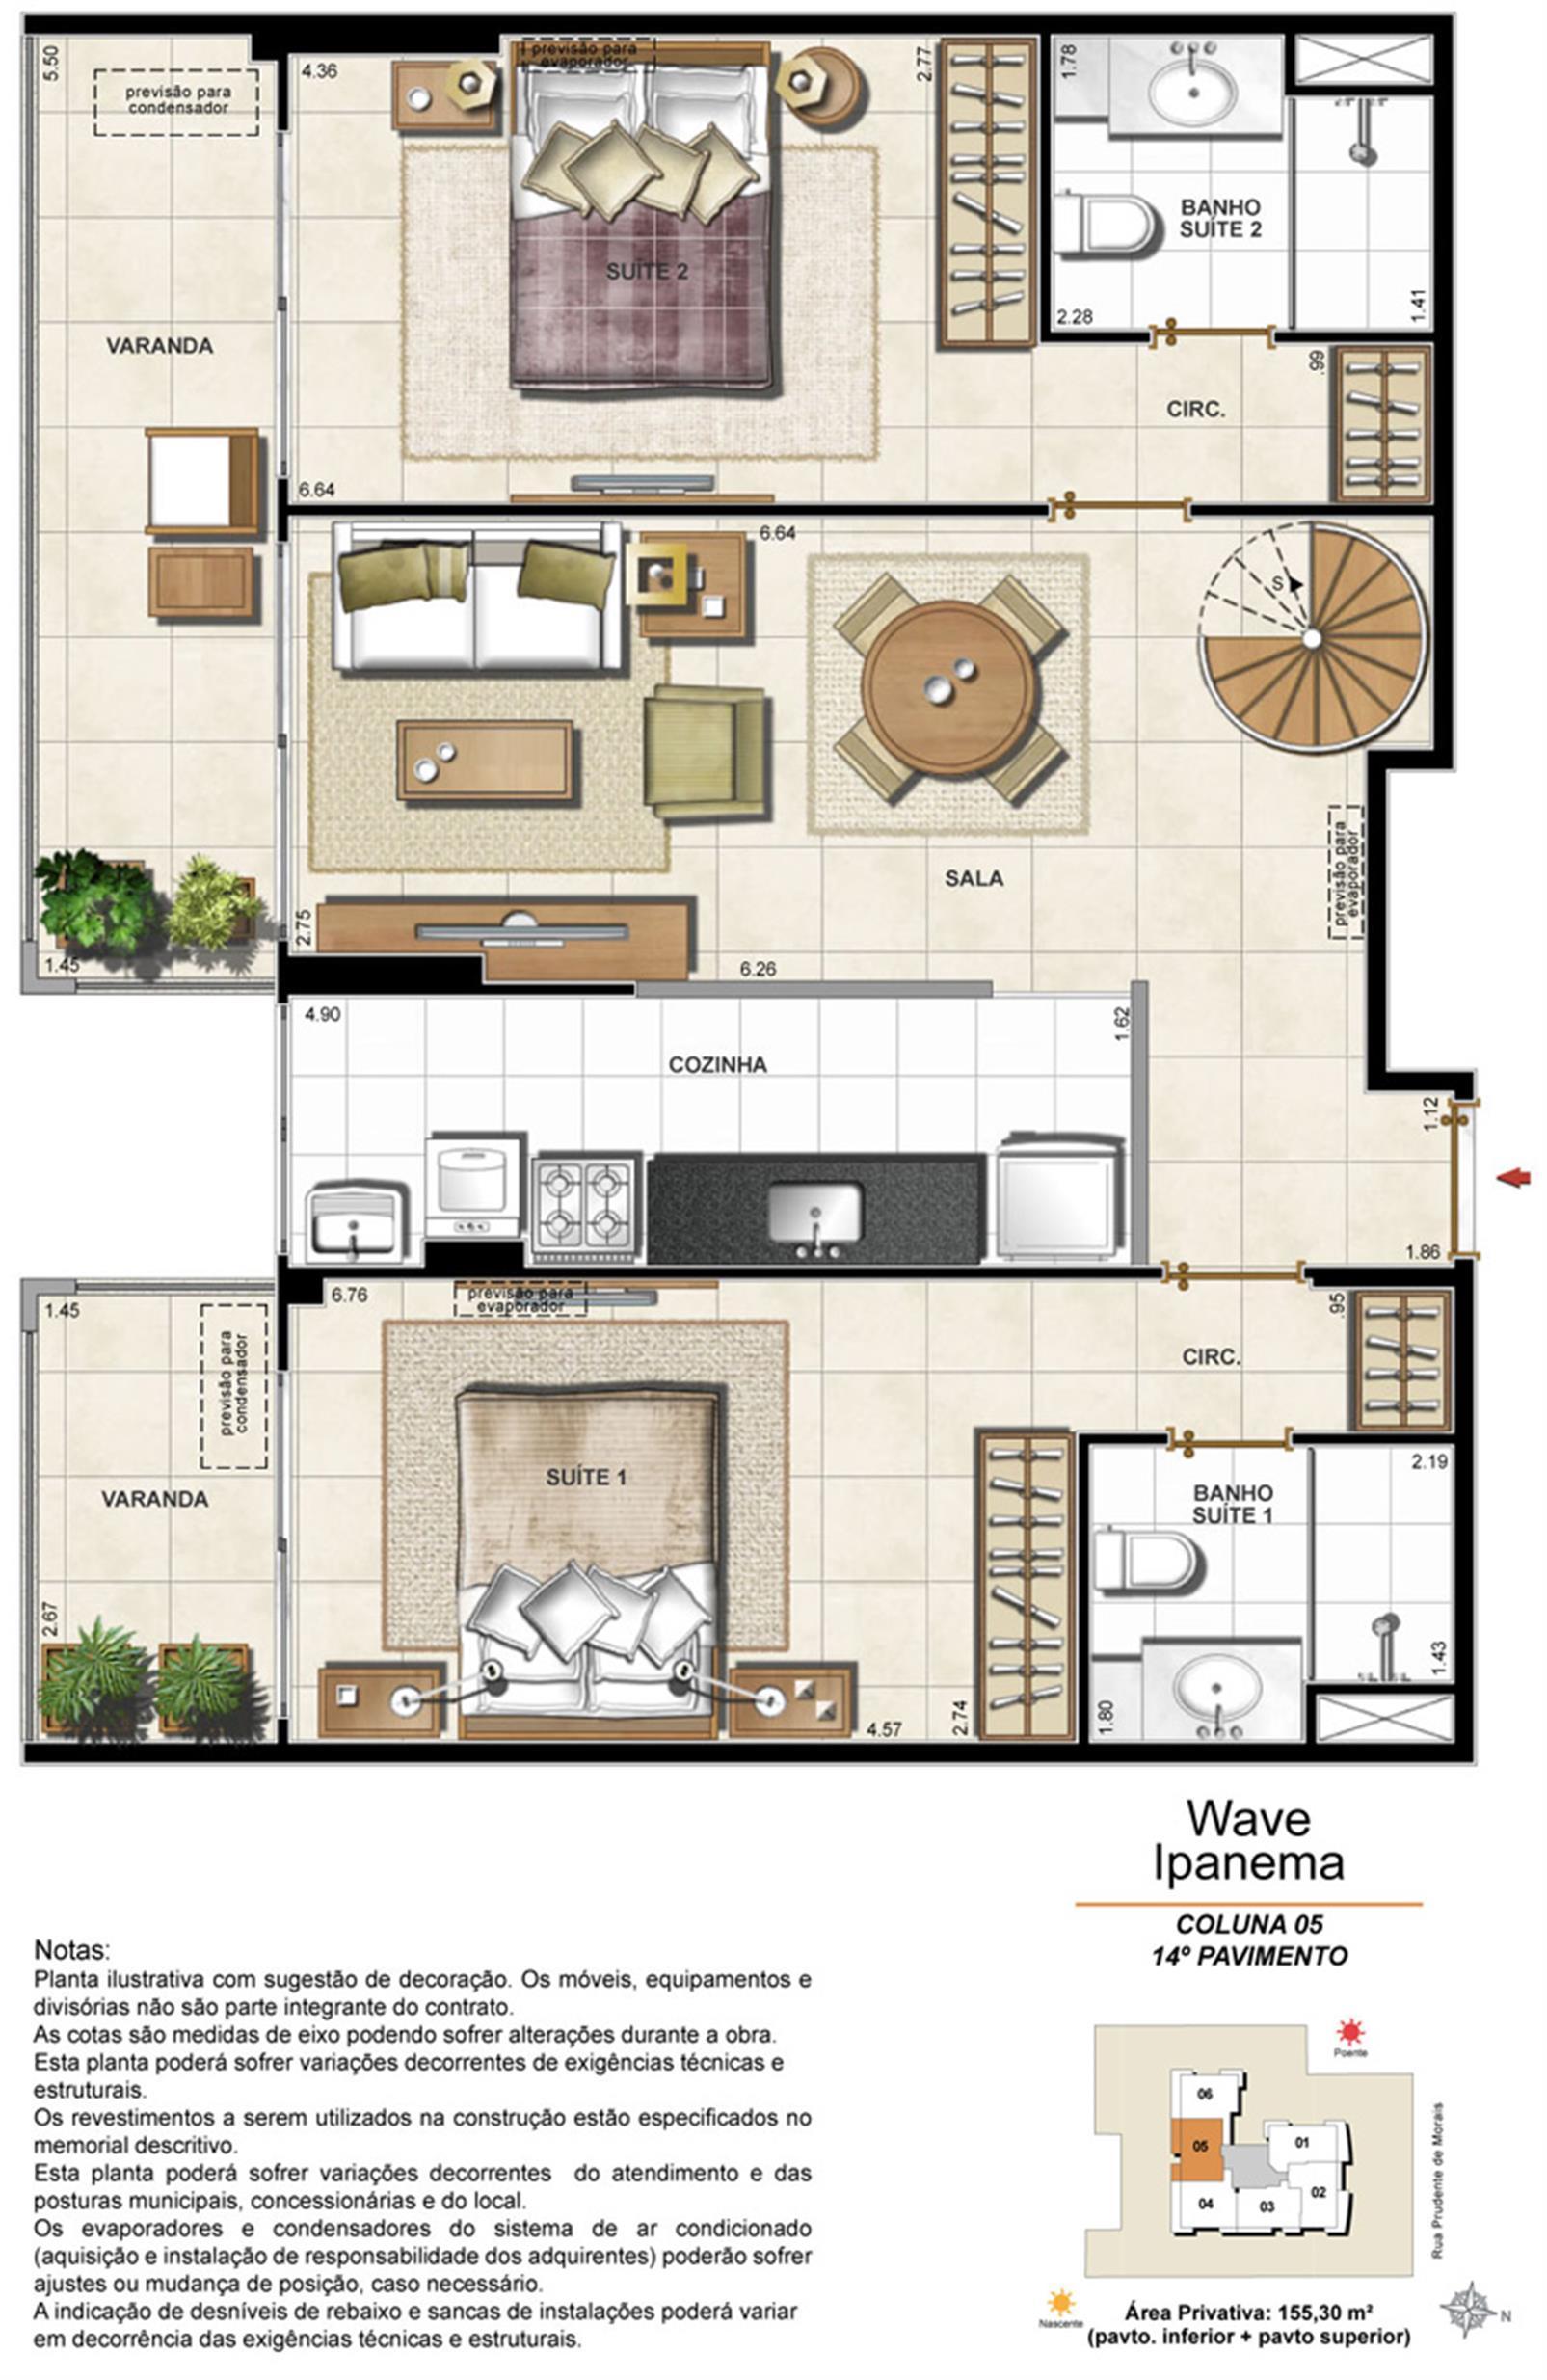 Apartamento Cobertura 1405 | Wave Ipanema – Apartamentoem  Ipanema - Rio de Janeiro - Rio de Janeiro